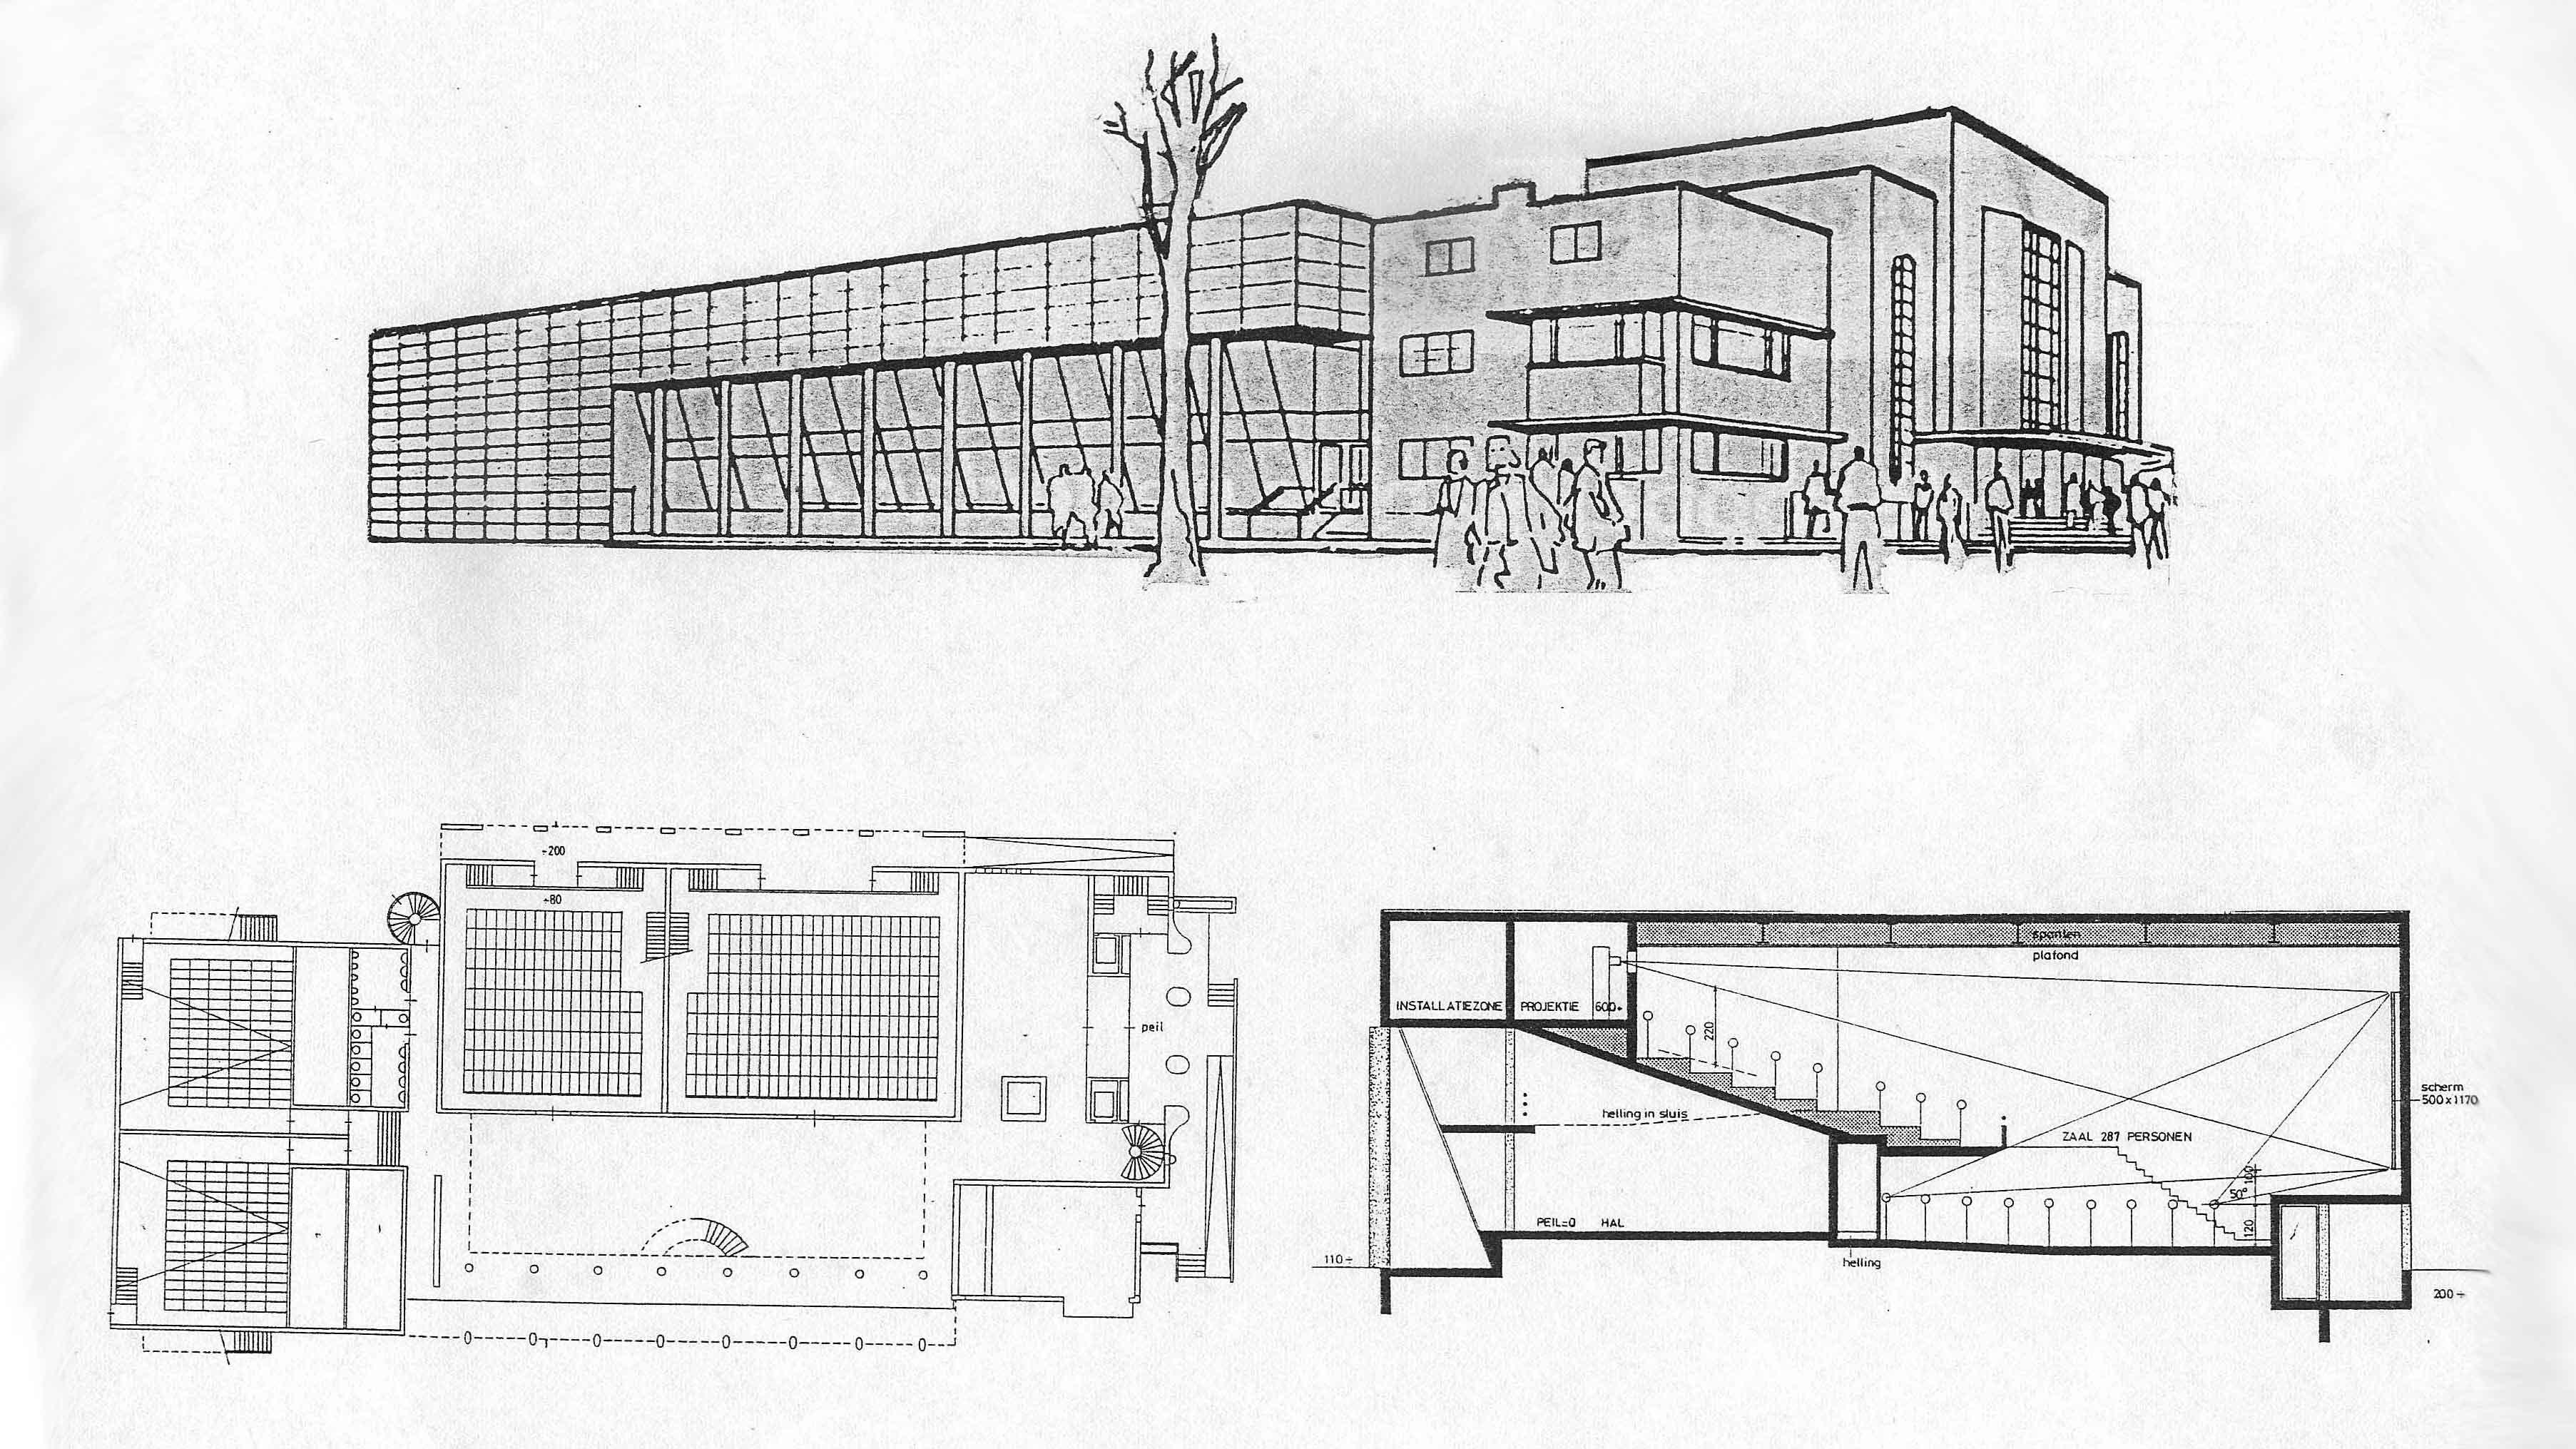 bioscoop grand theatre amersfoort architect marja haring